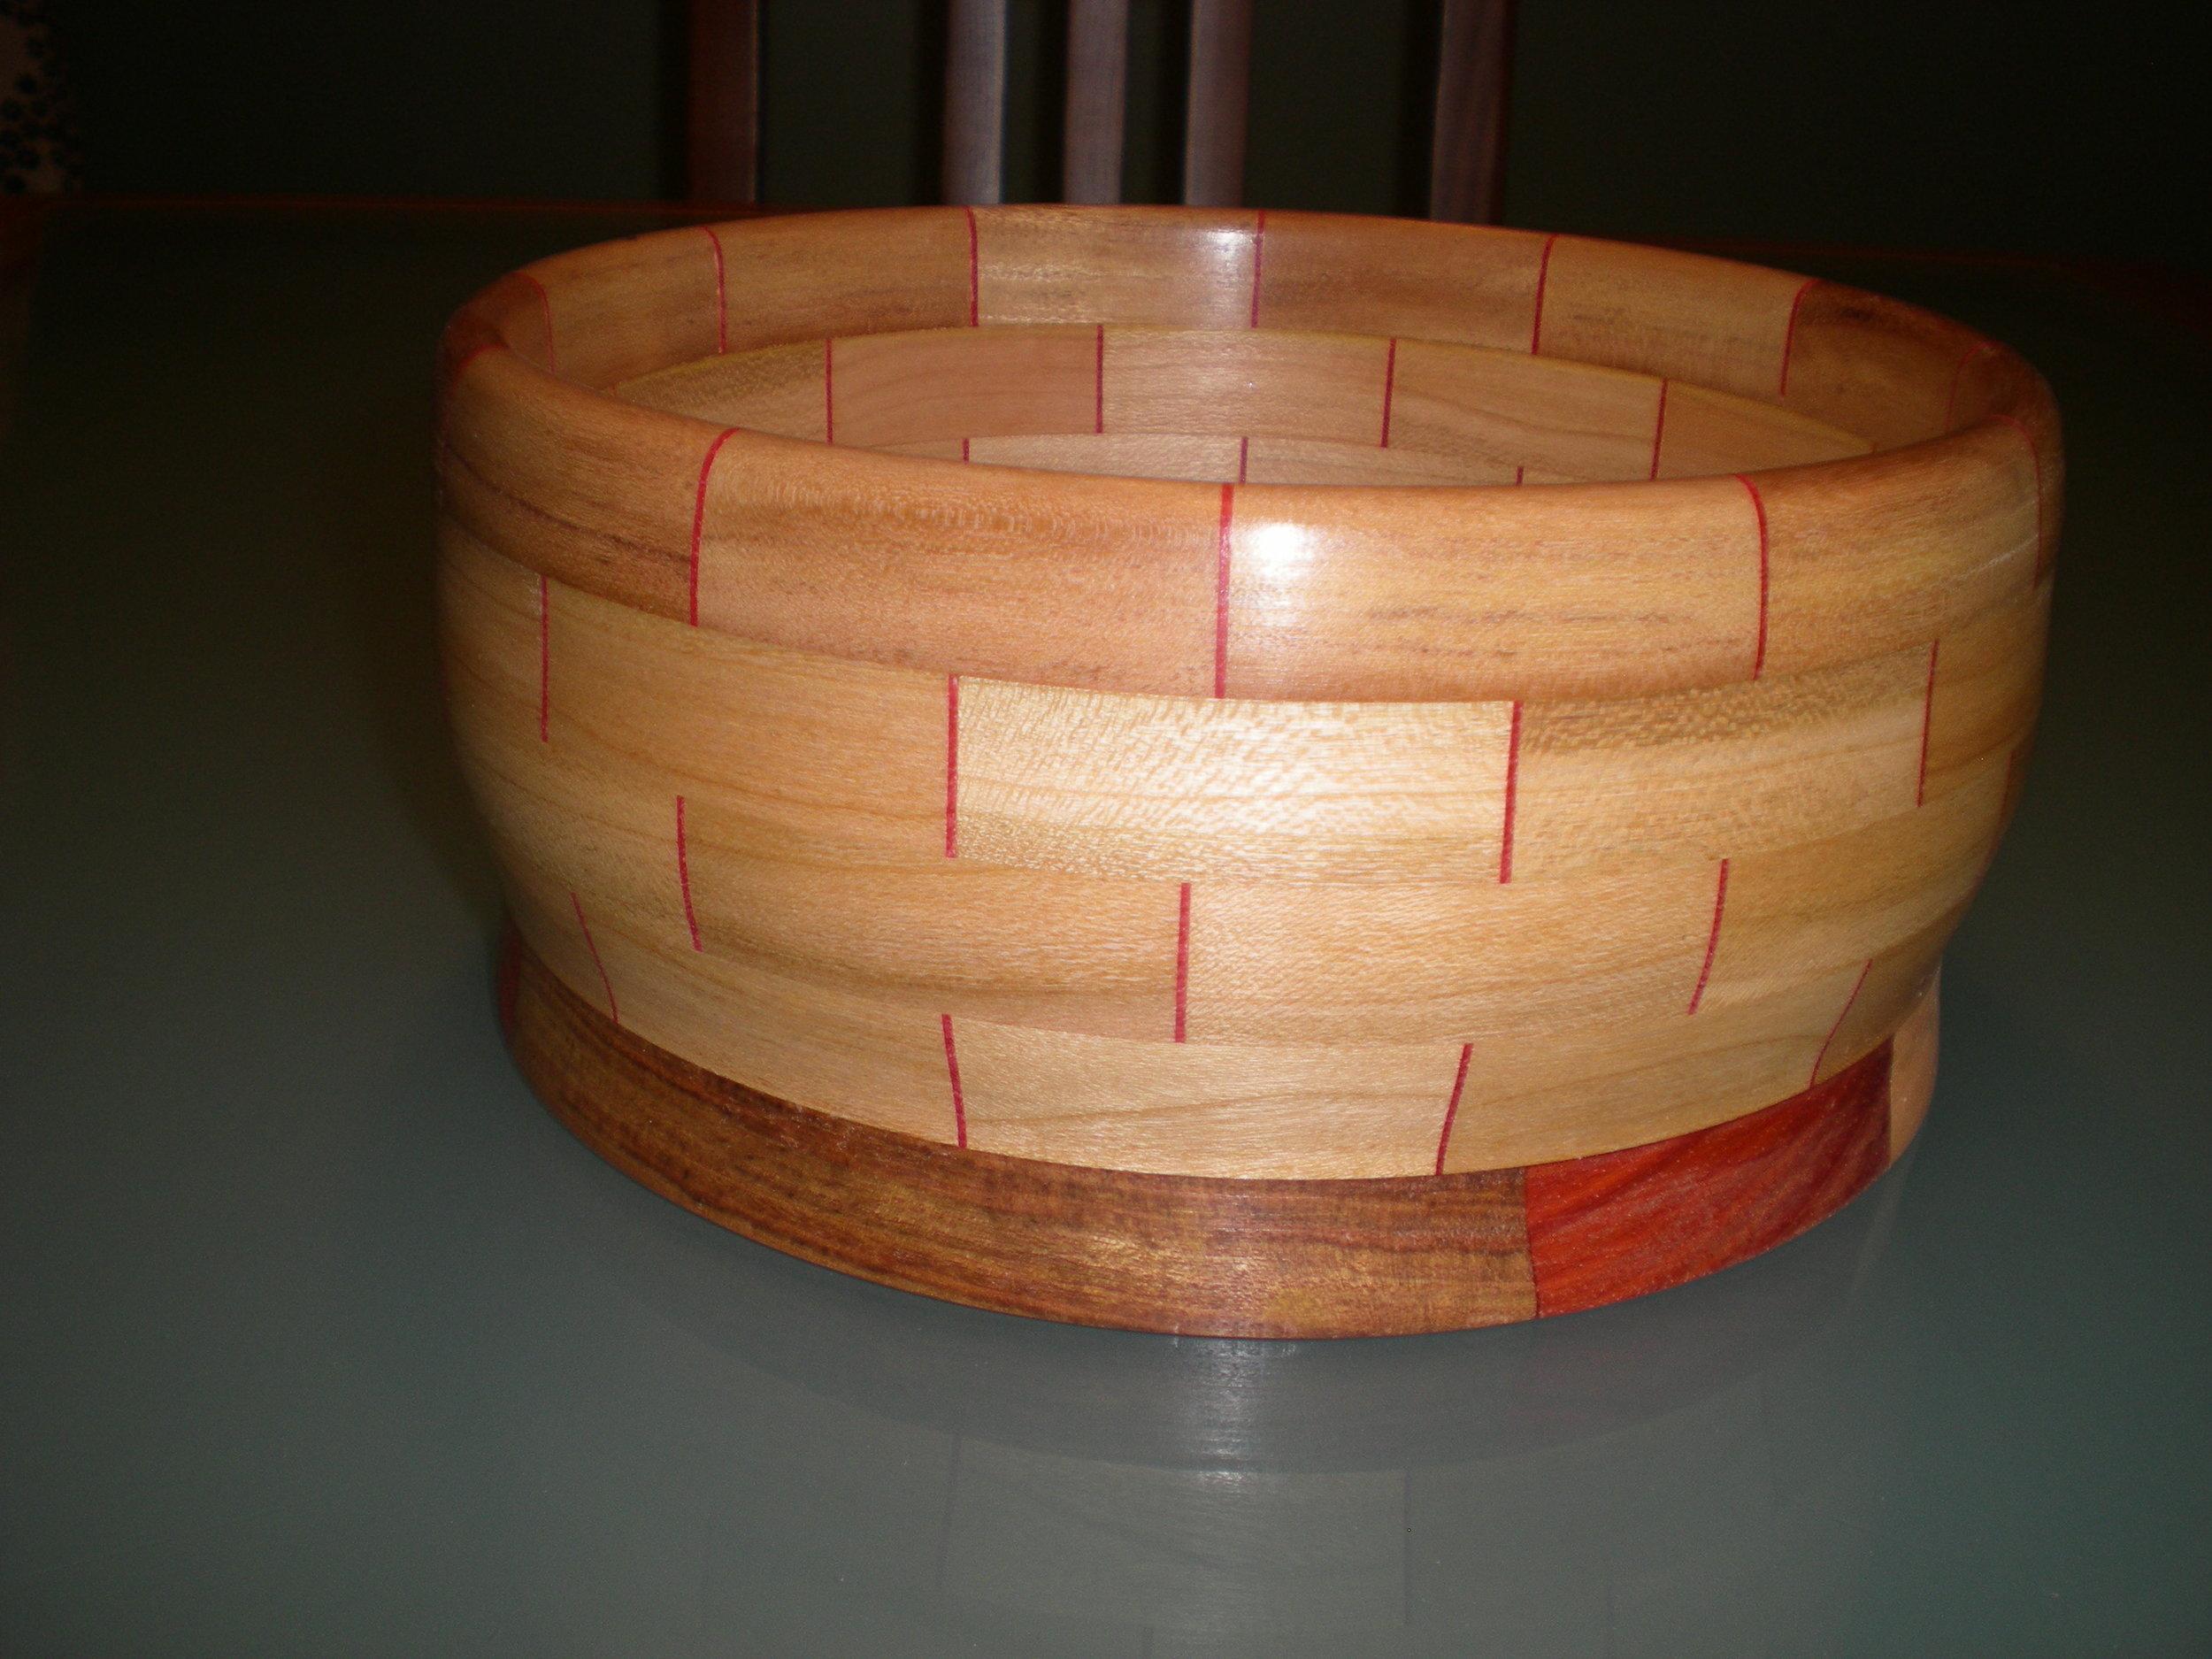 RJC Wood Creations - Bowls (41).JPG